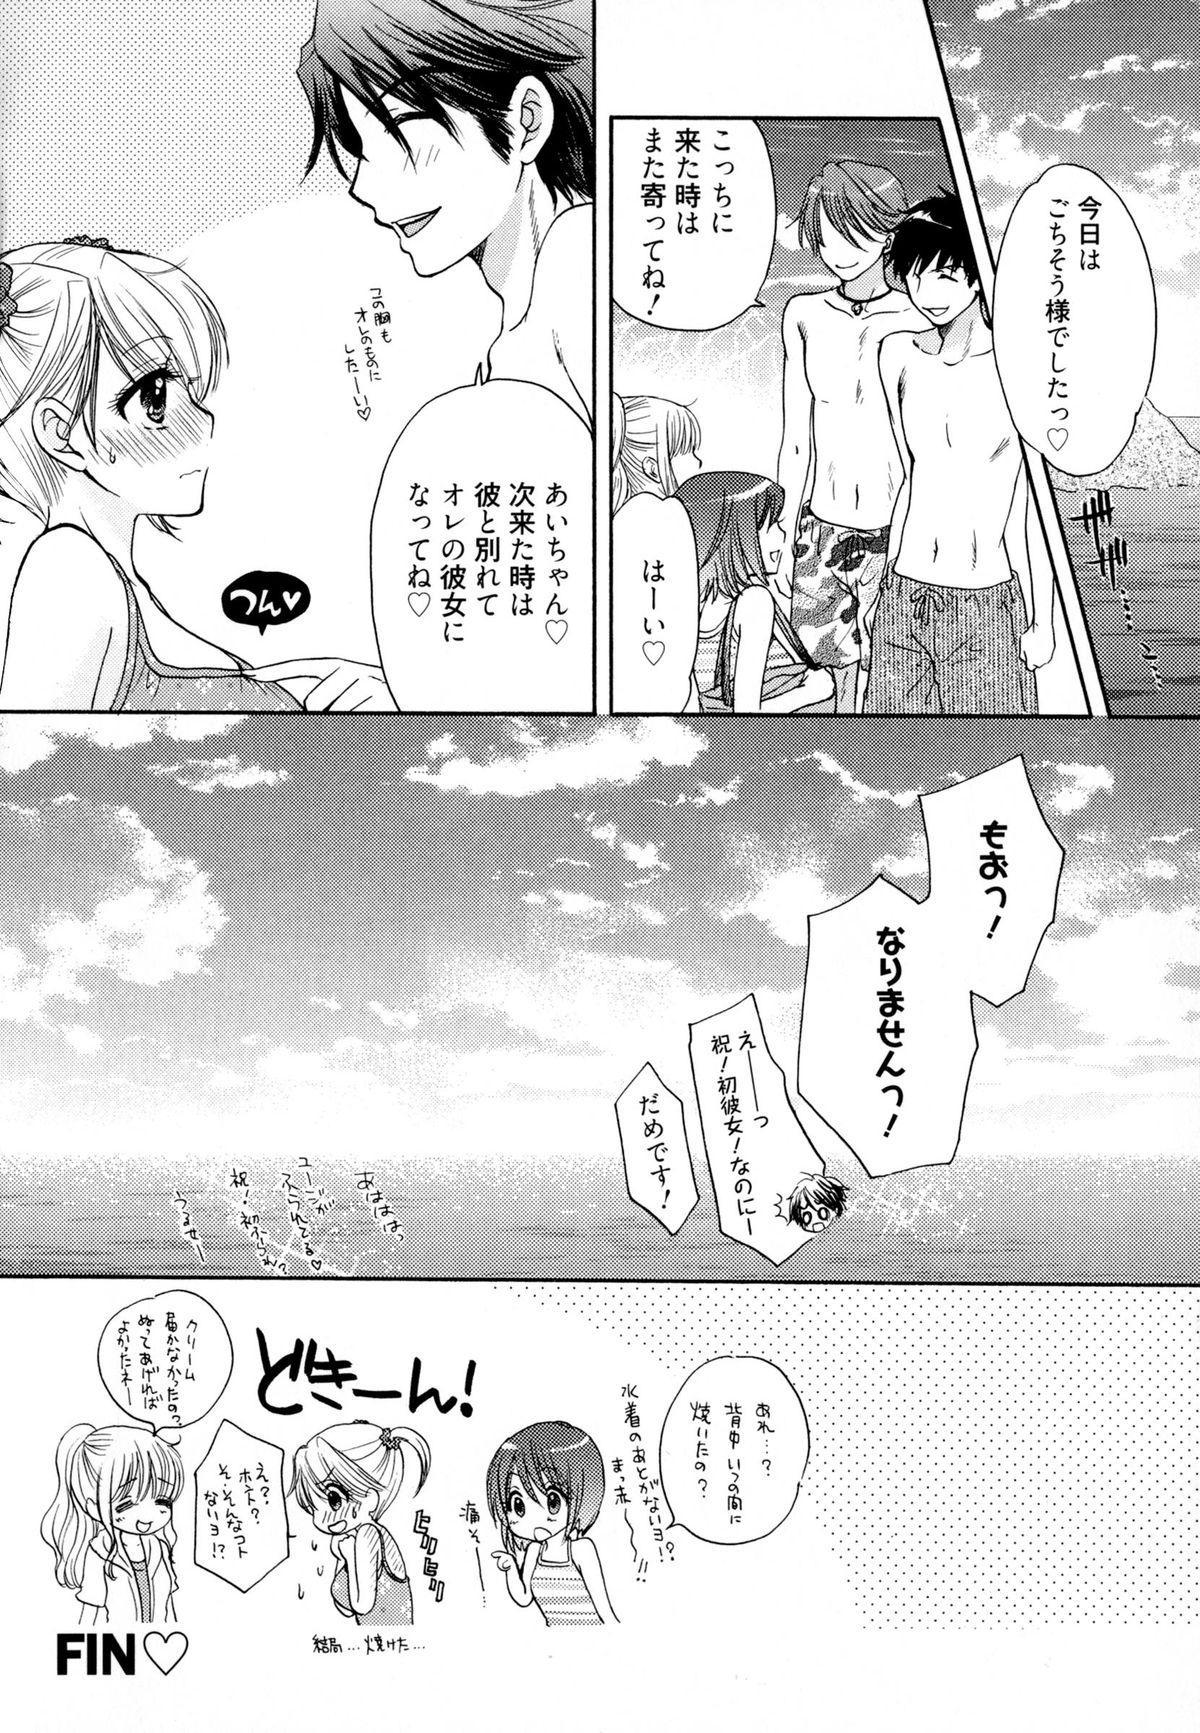 The Great Escape 4 Shokai Genteiban 151